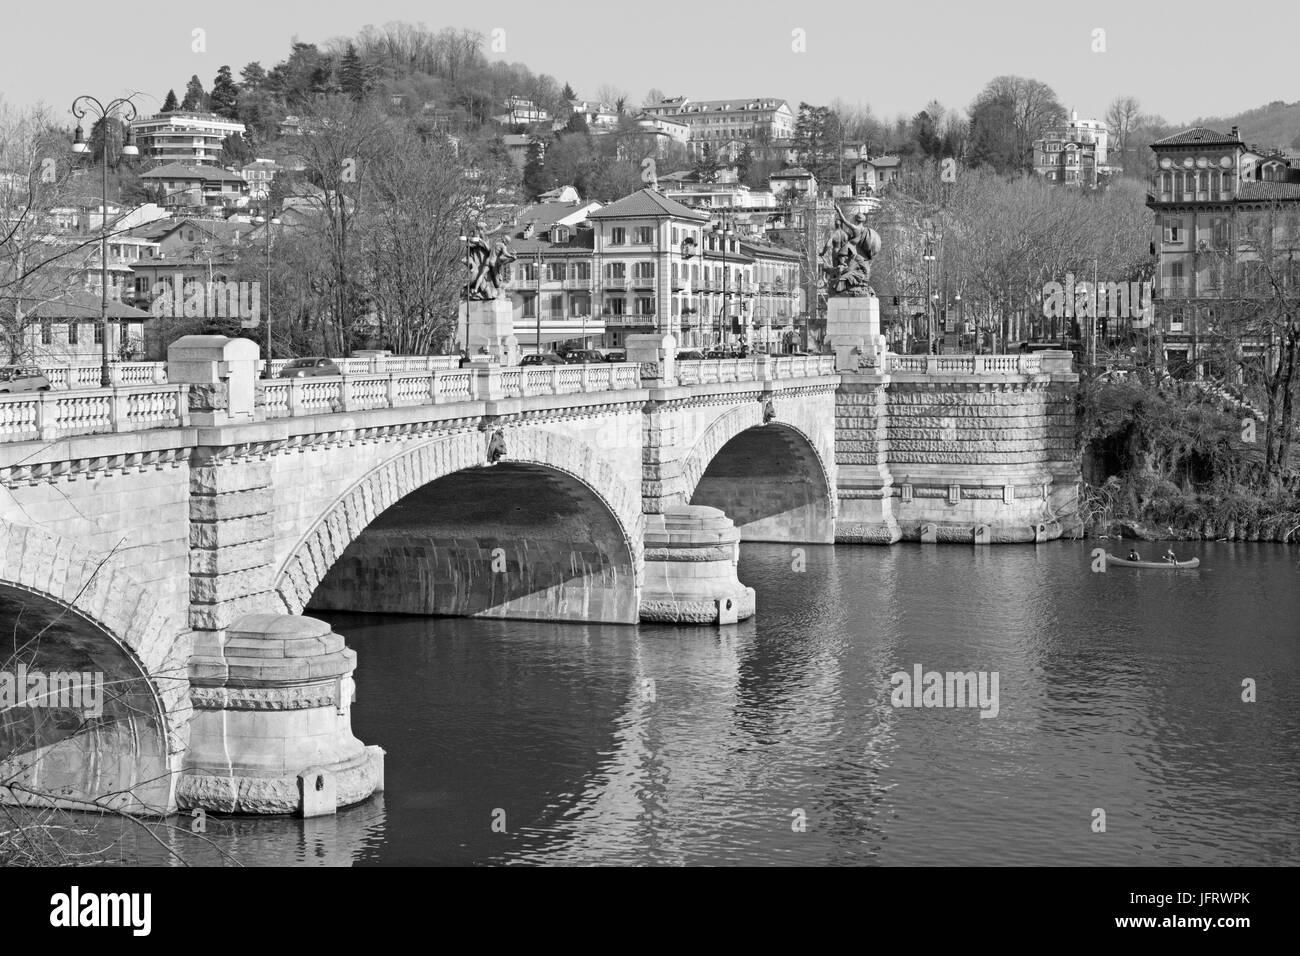 Turin - The Bridge Umberto I. Stock Photo